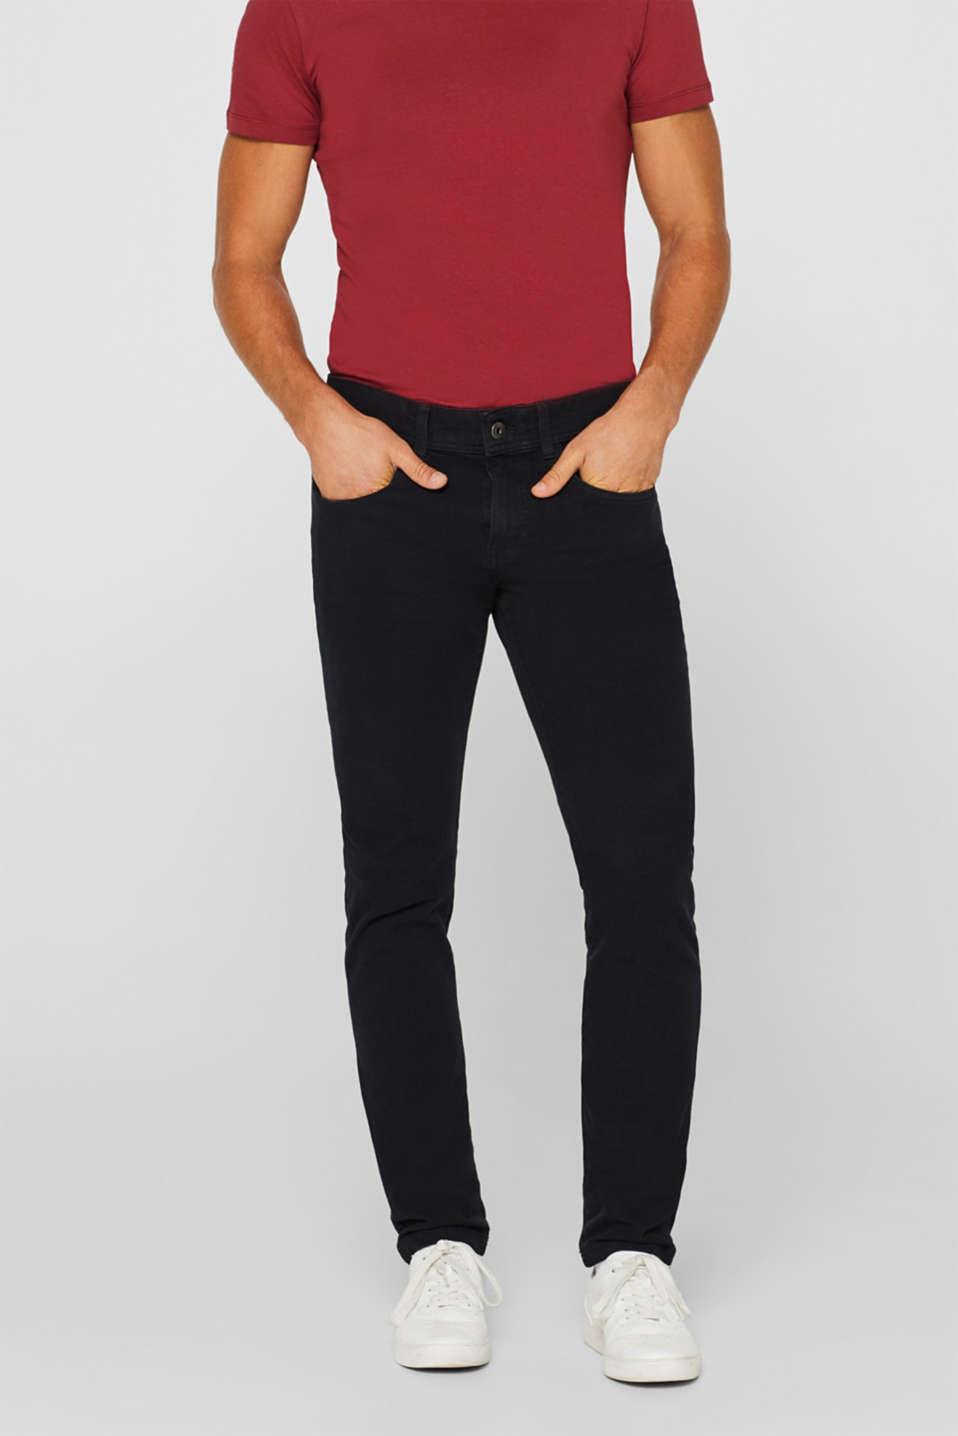 Super stretch jeans in an extra slim fit